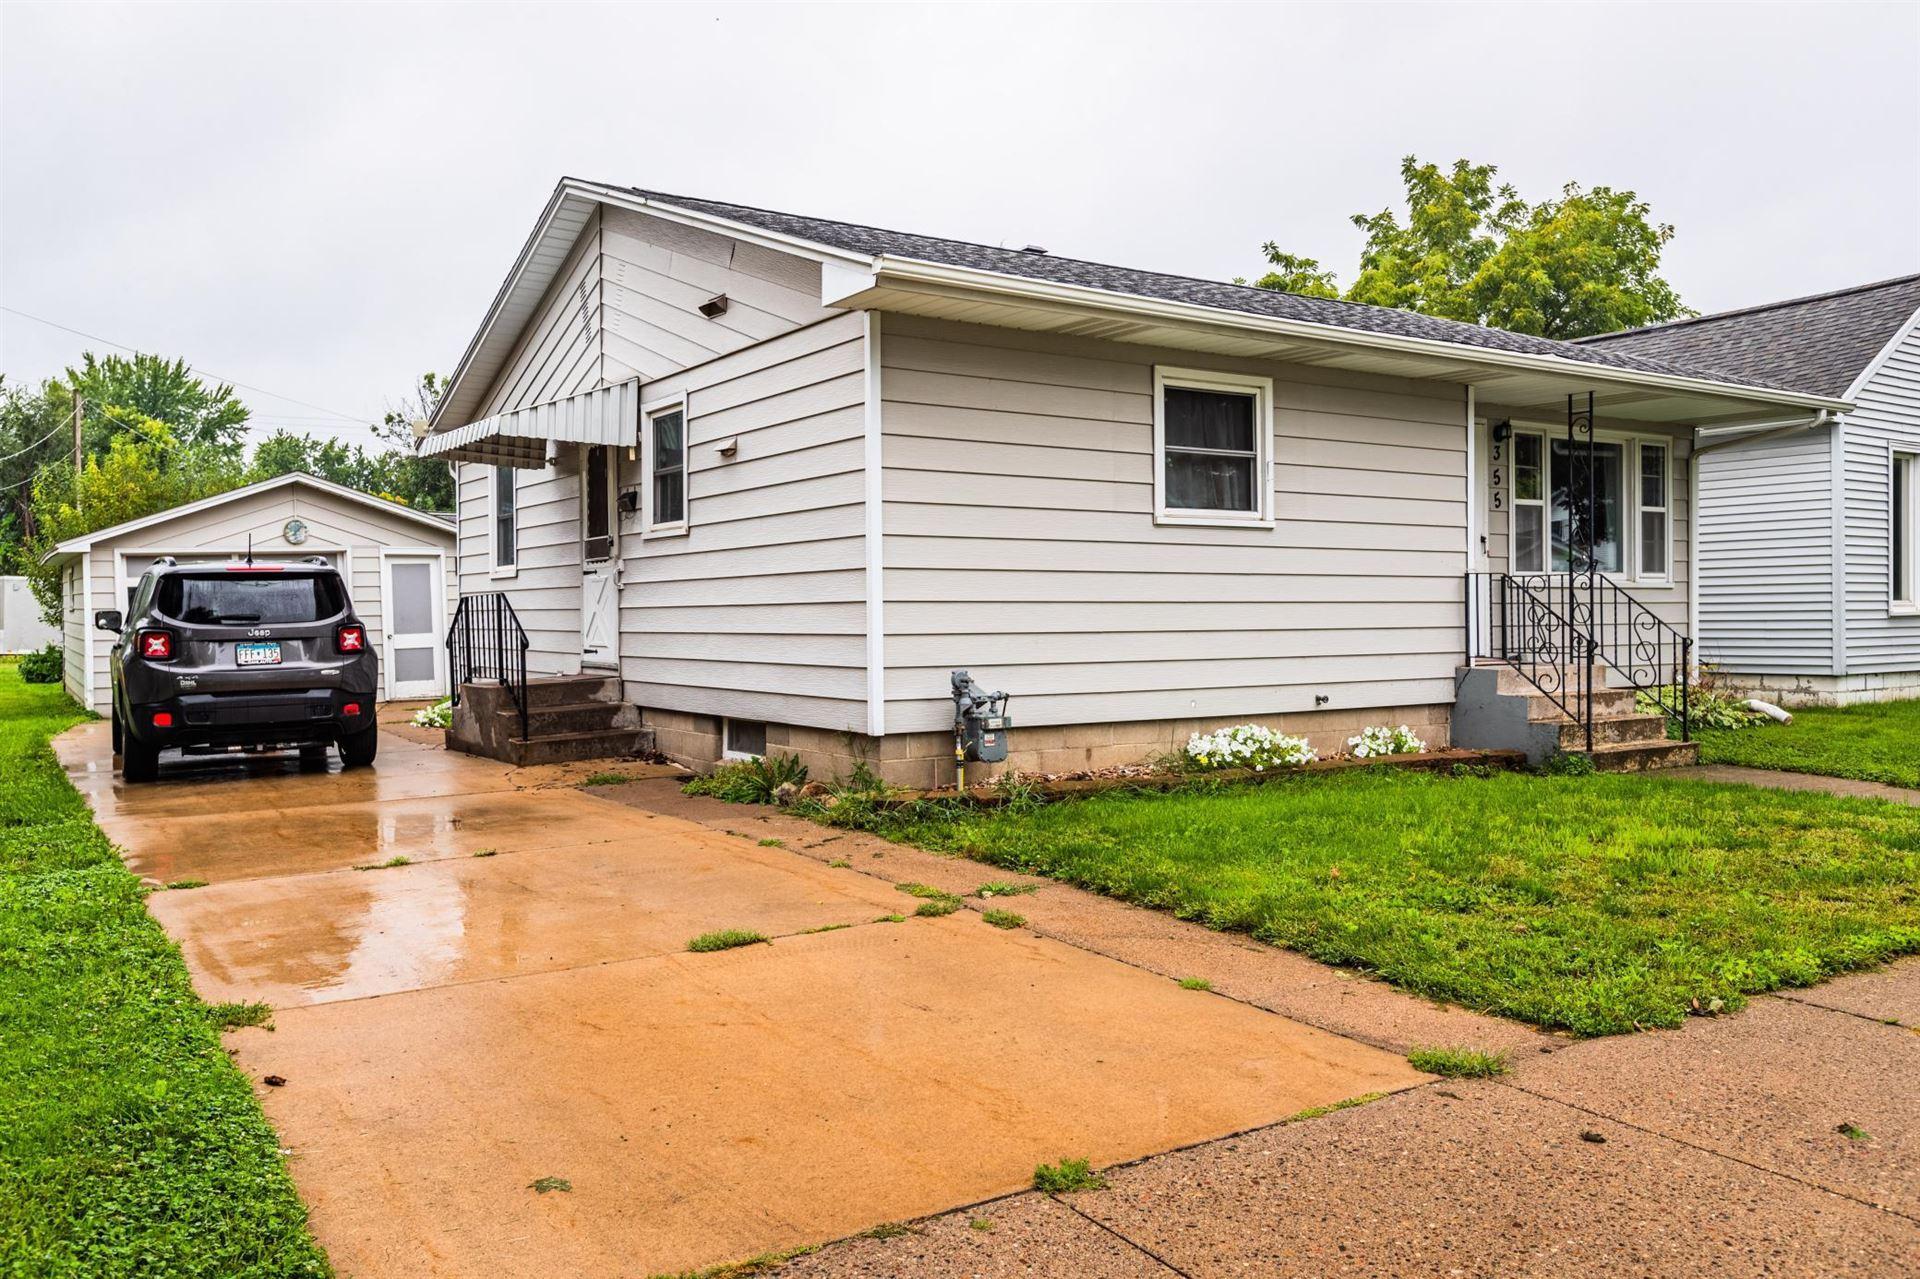 355 W Mark Street, Winona, MN 55987 - MLS#: 6095084